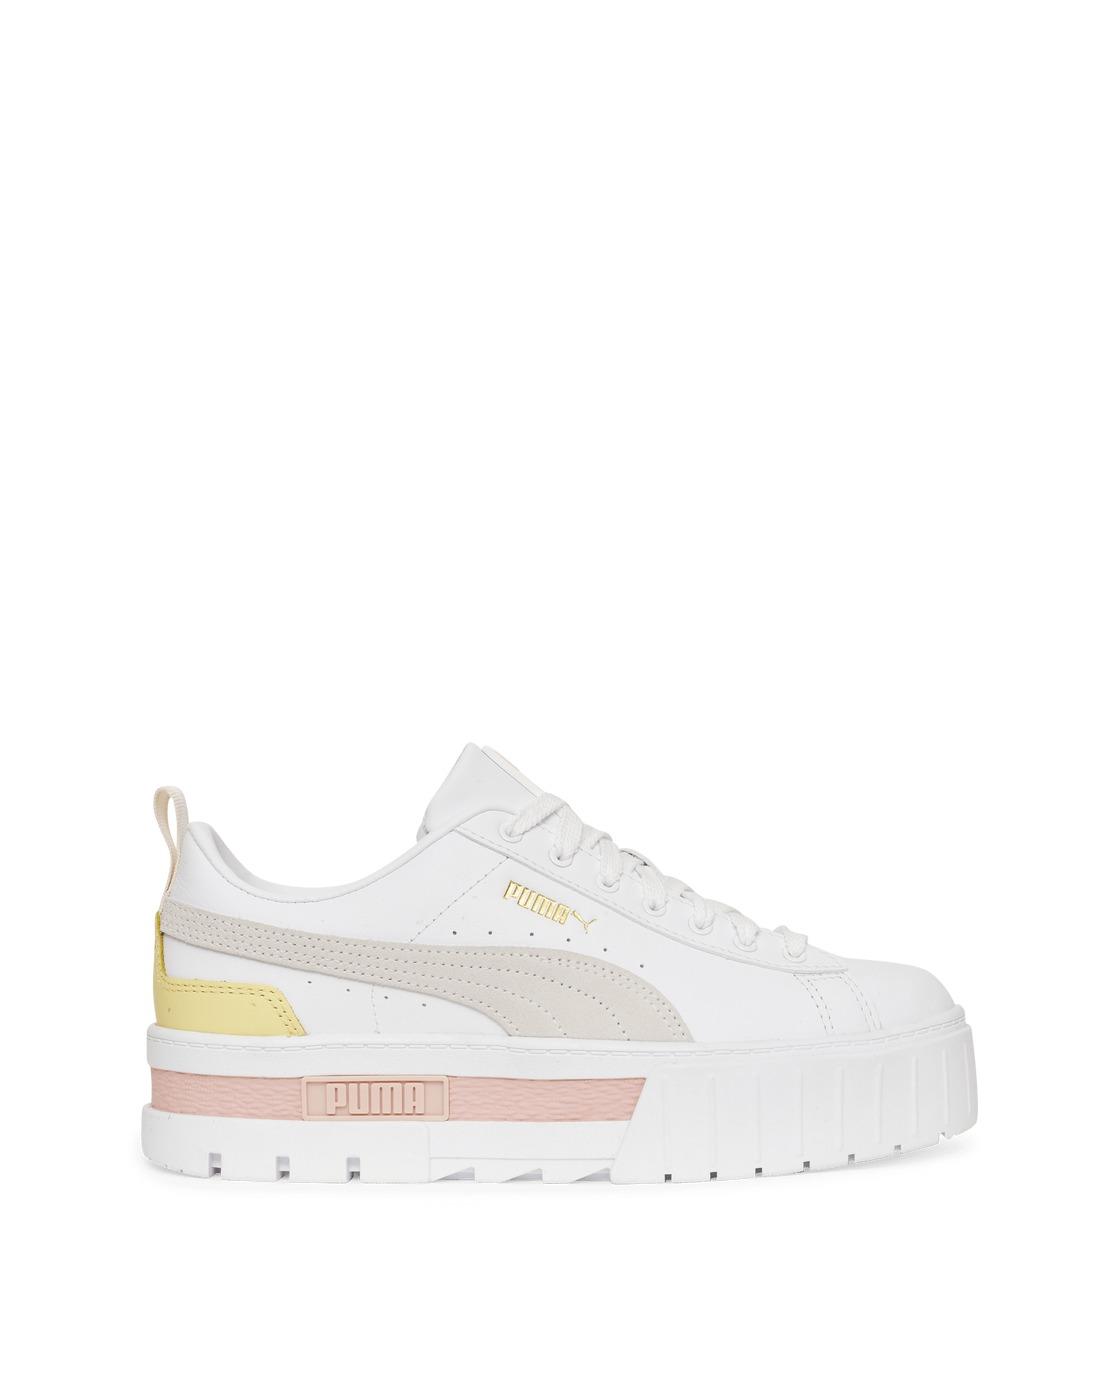 Puma Mayze Lth Sneakers Puma White/Lotus Puma